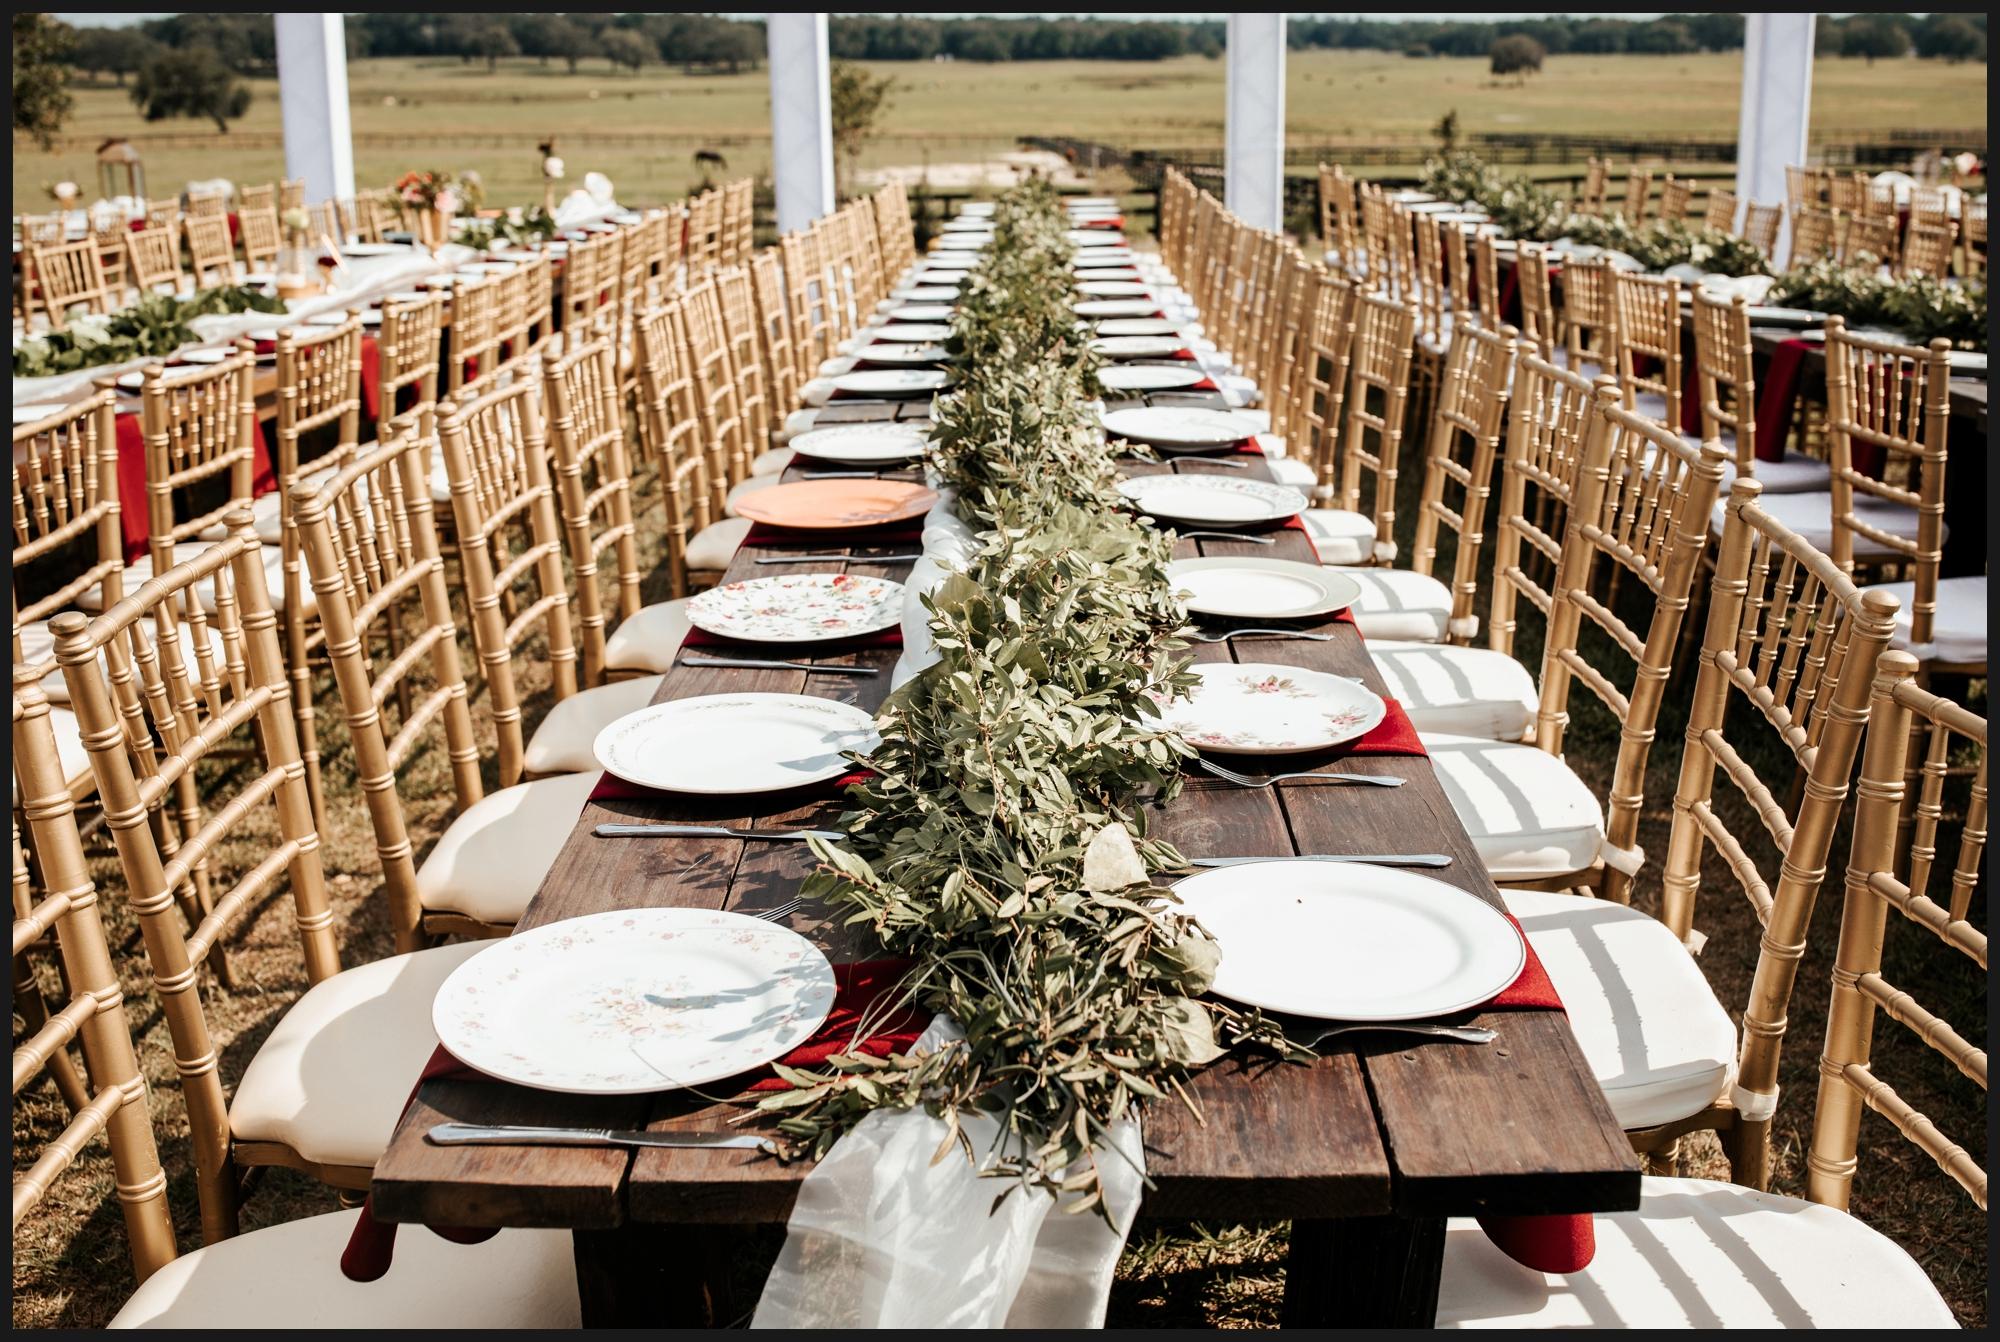 Orlando-Wedding-Photographer-destination-wedding-photographer-florida-wedding-photographer-hawaii-wedding-photographer_0602.jpg